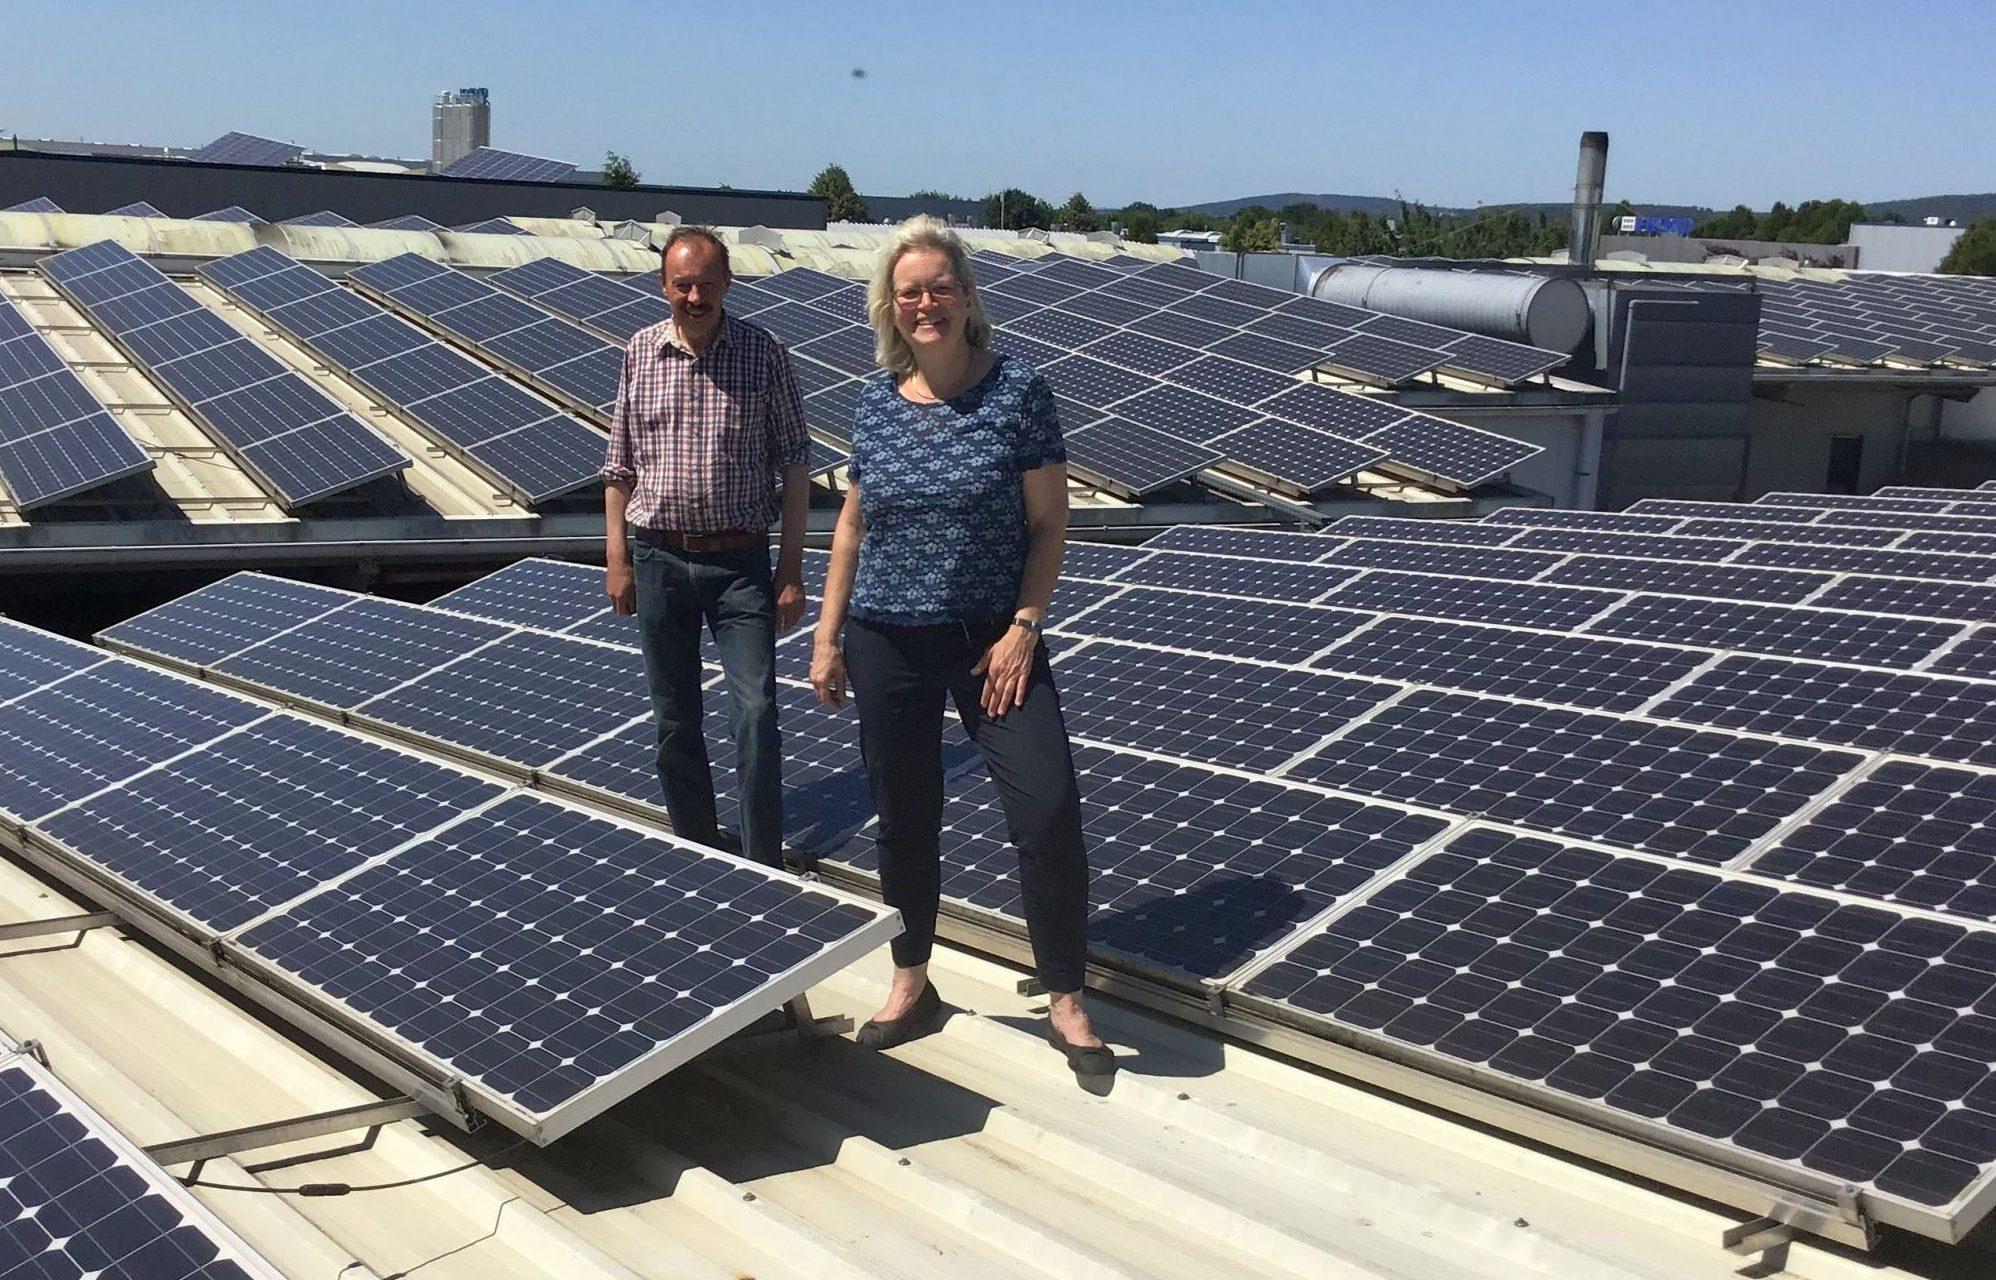 Großes Solar-Potenzial bei Unternehmen